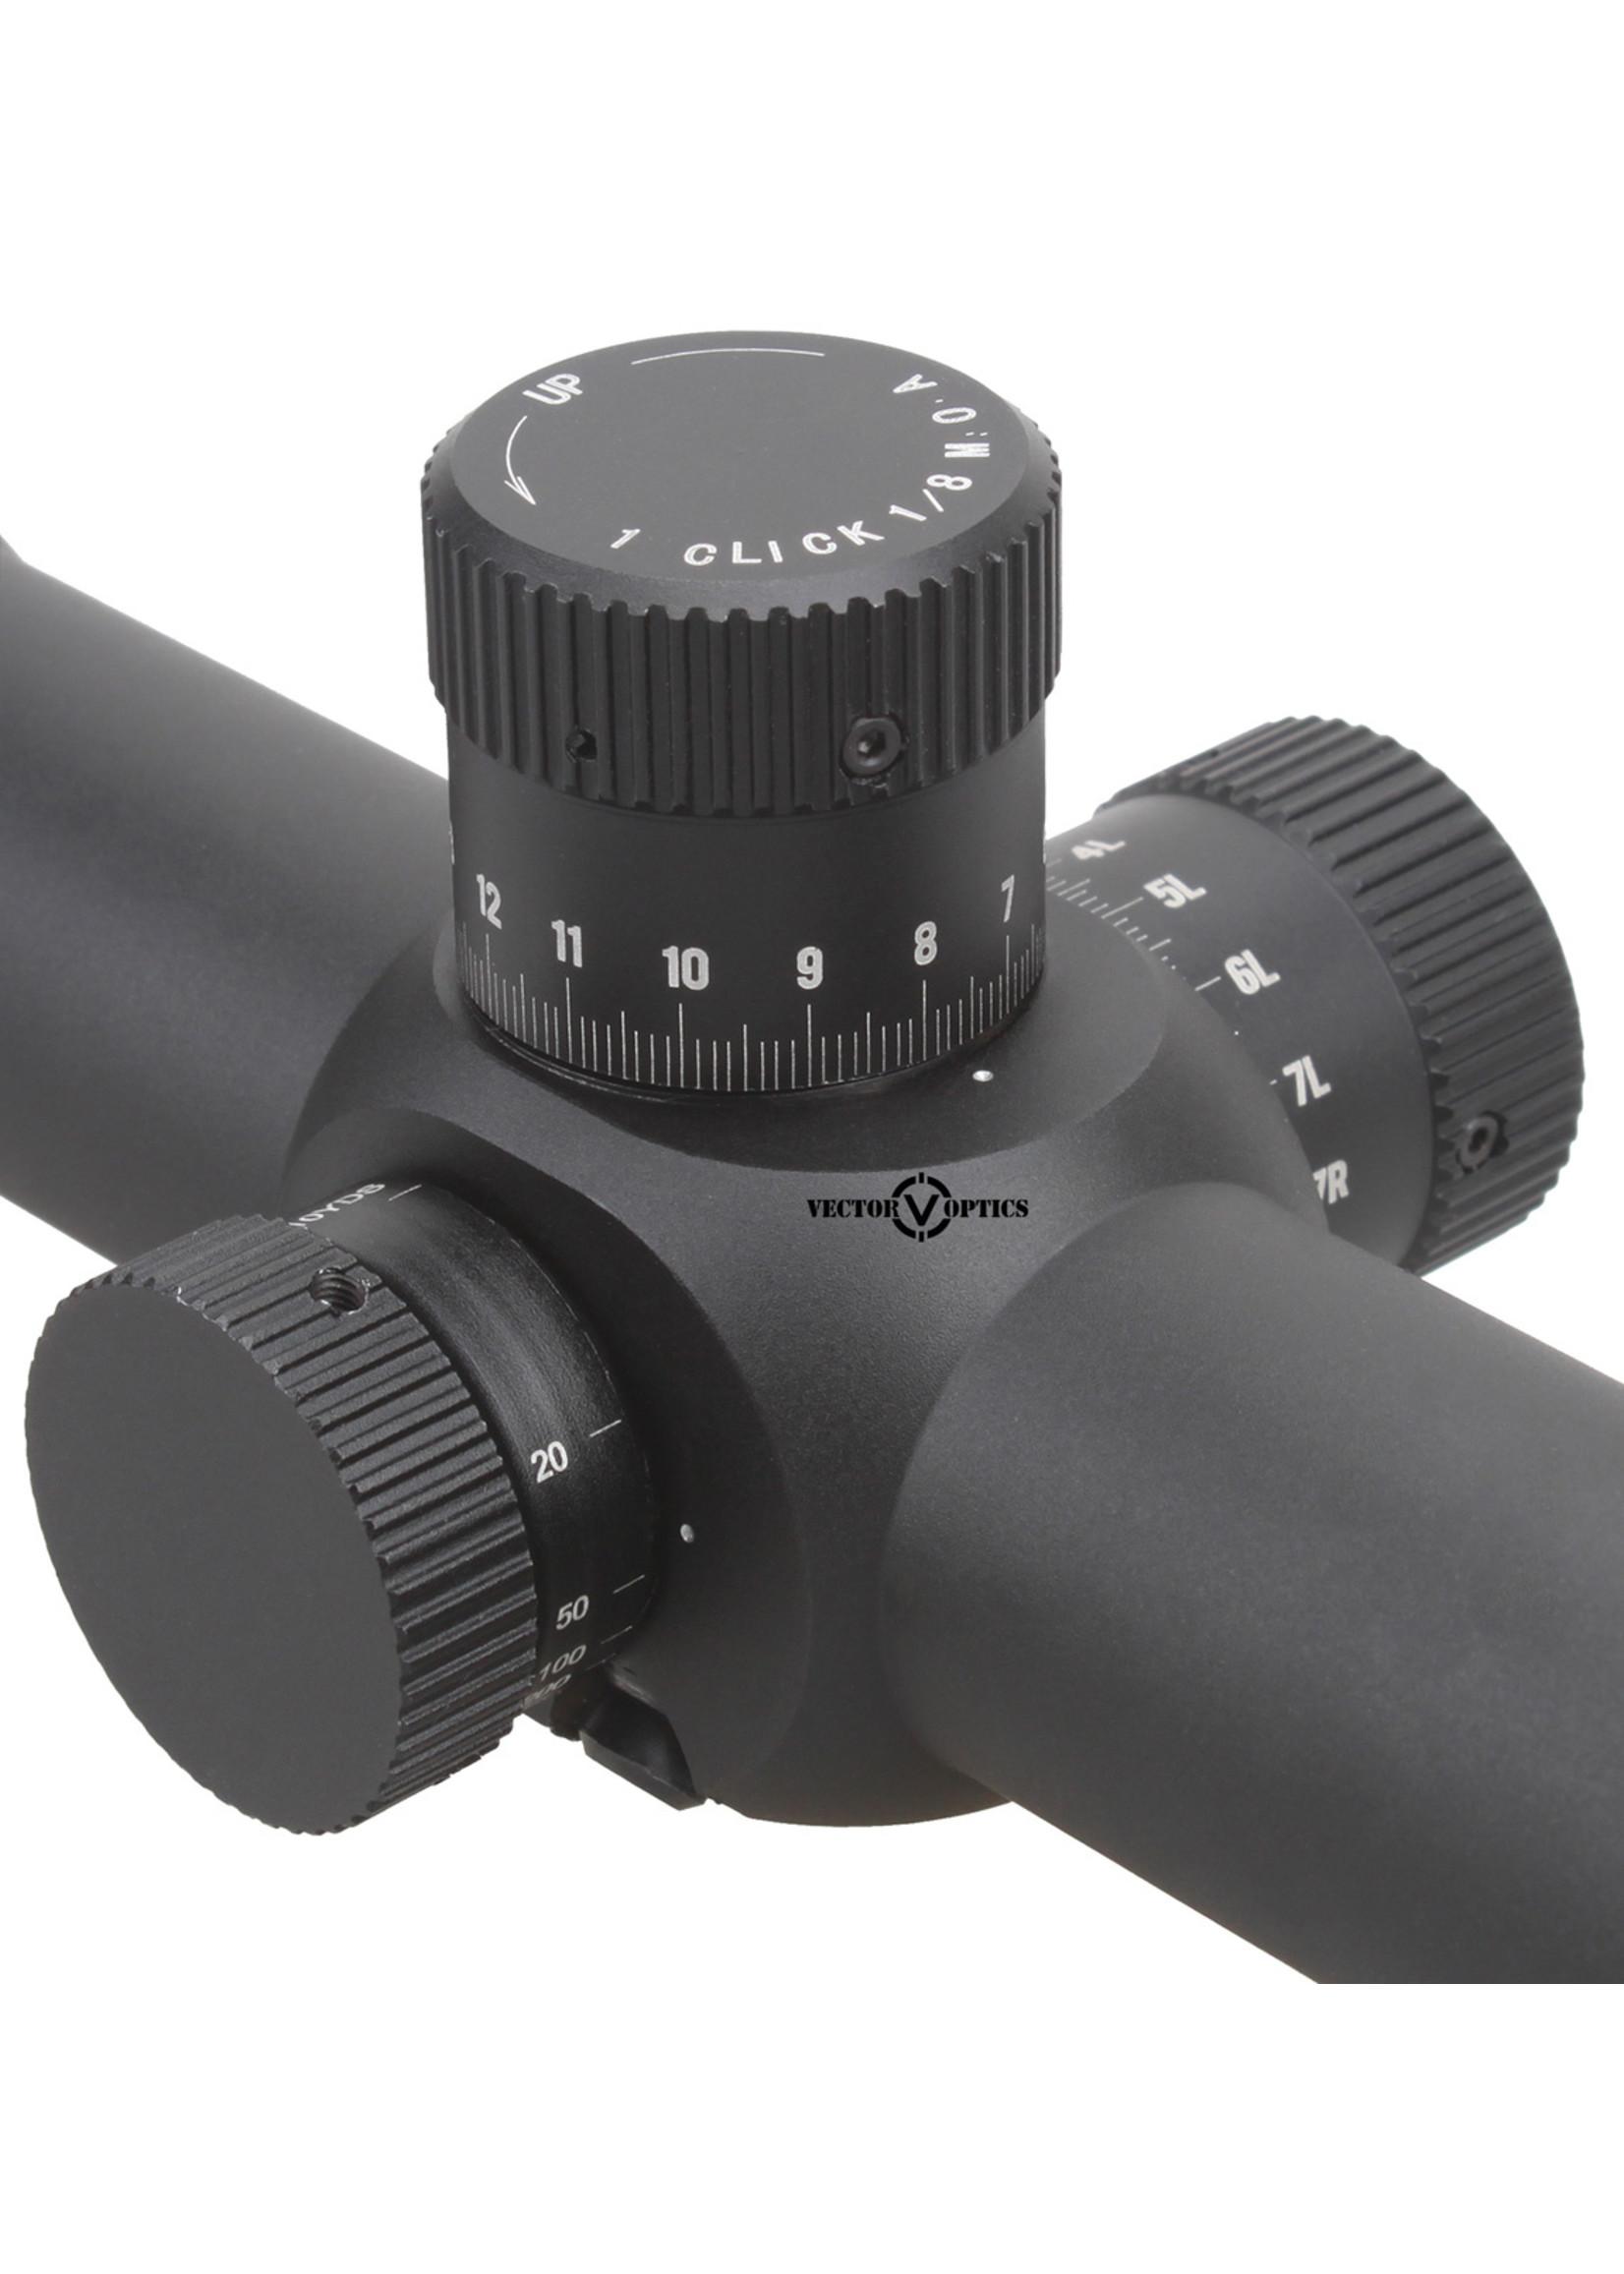 Vector Optics Vector Optics Atlas 5-30x56 SFP LongRange Riflescope 35mmTube 1/8MOA